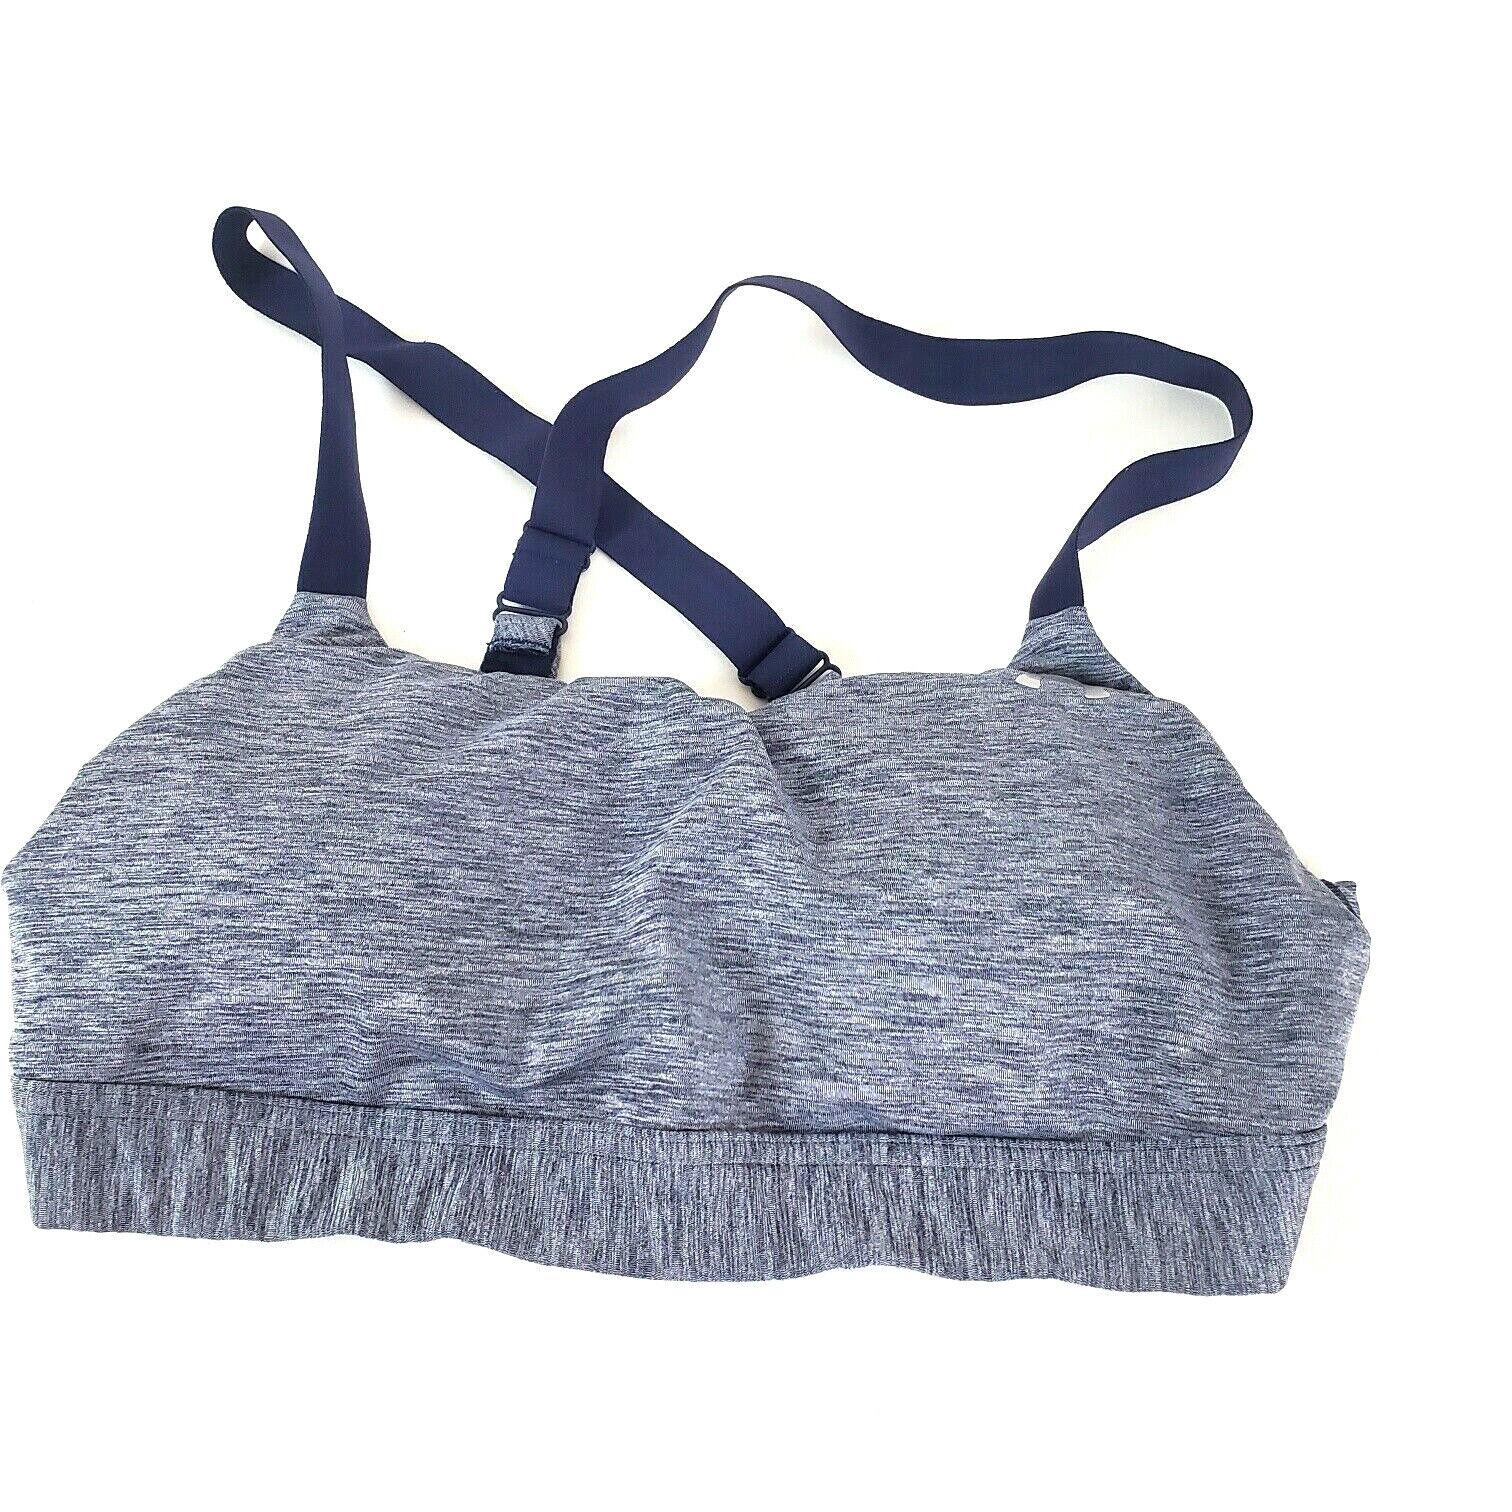 Women's Under Armour Heat Blue Sports Bra with Adjustable Strap Pads Size Medium